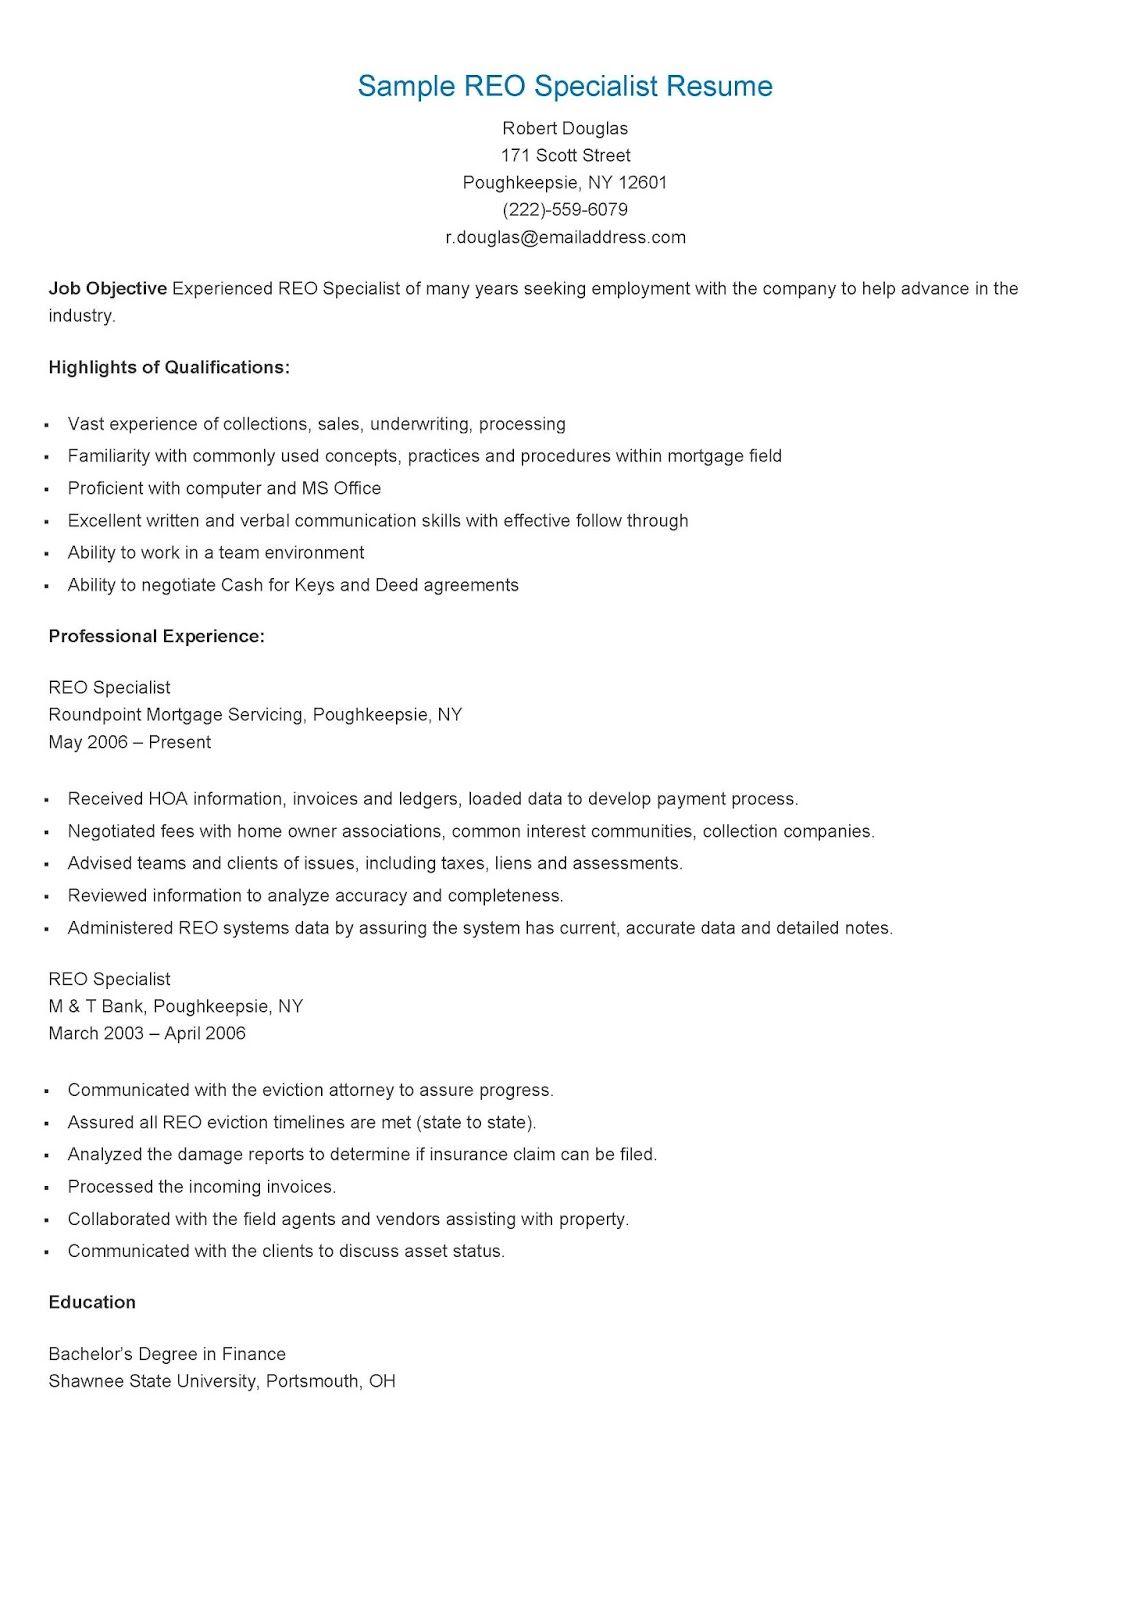 Sample REO Specialist Resume resame Sample resume